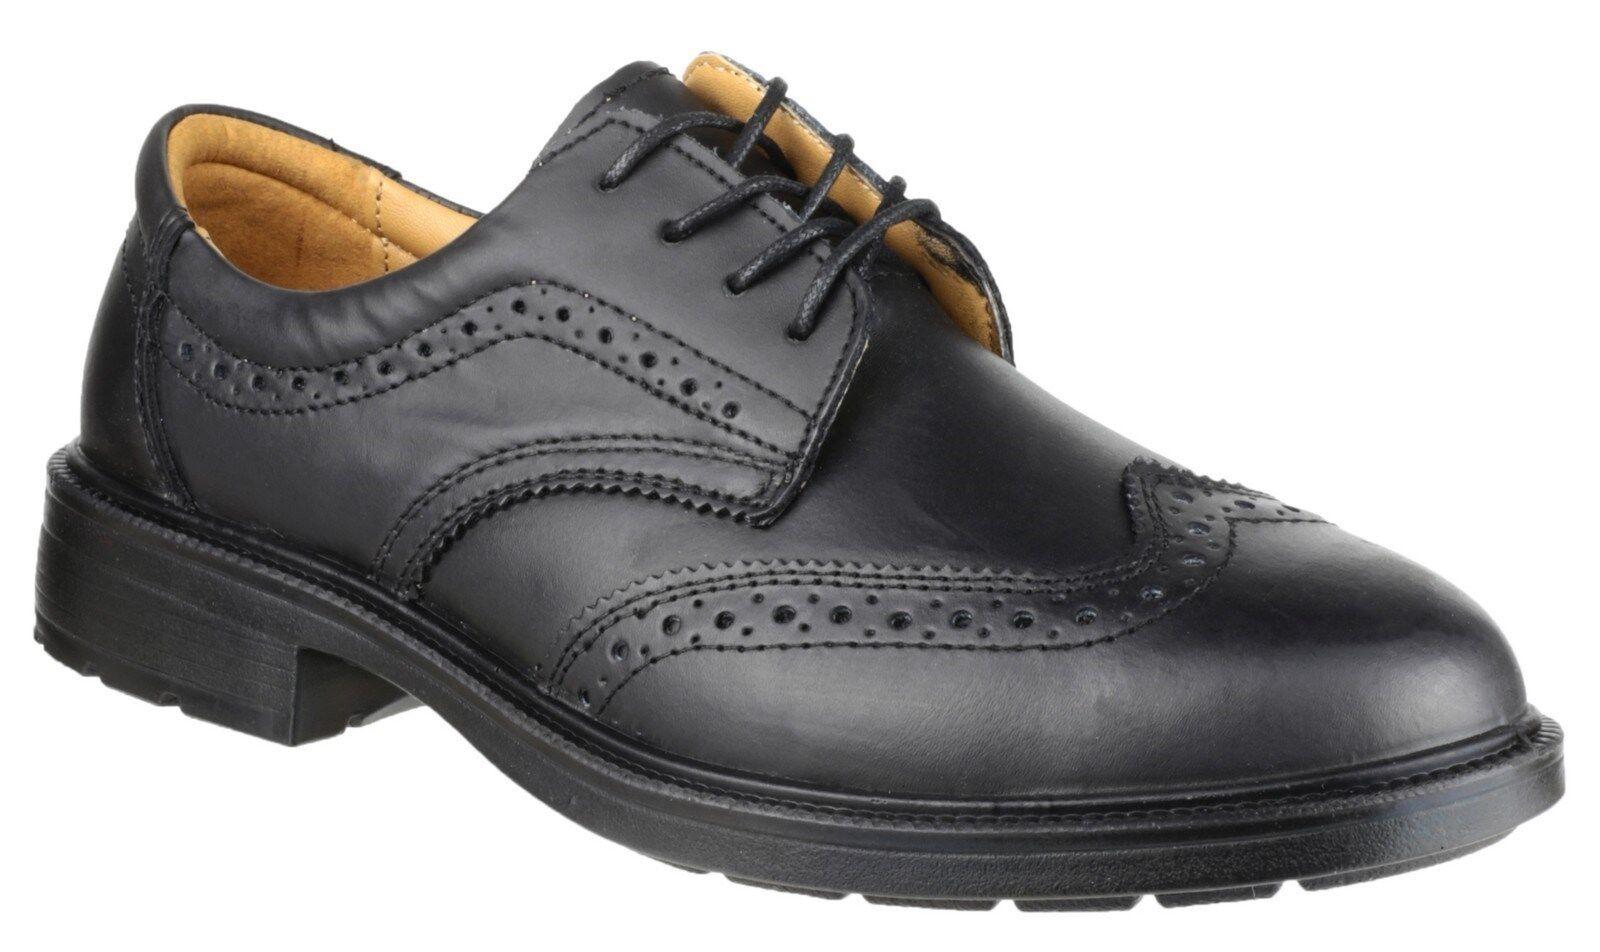 Amblers FS44 Safety shoes Mens Smart Steel Toe Cap Industrial Work Brogues